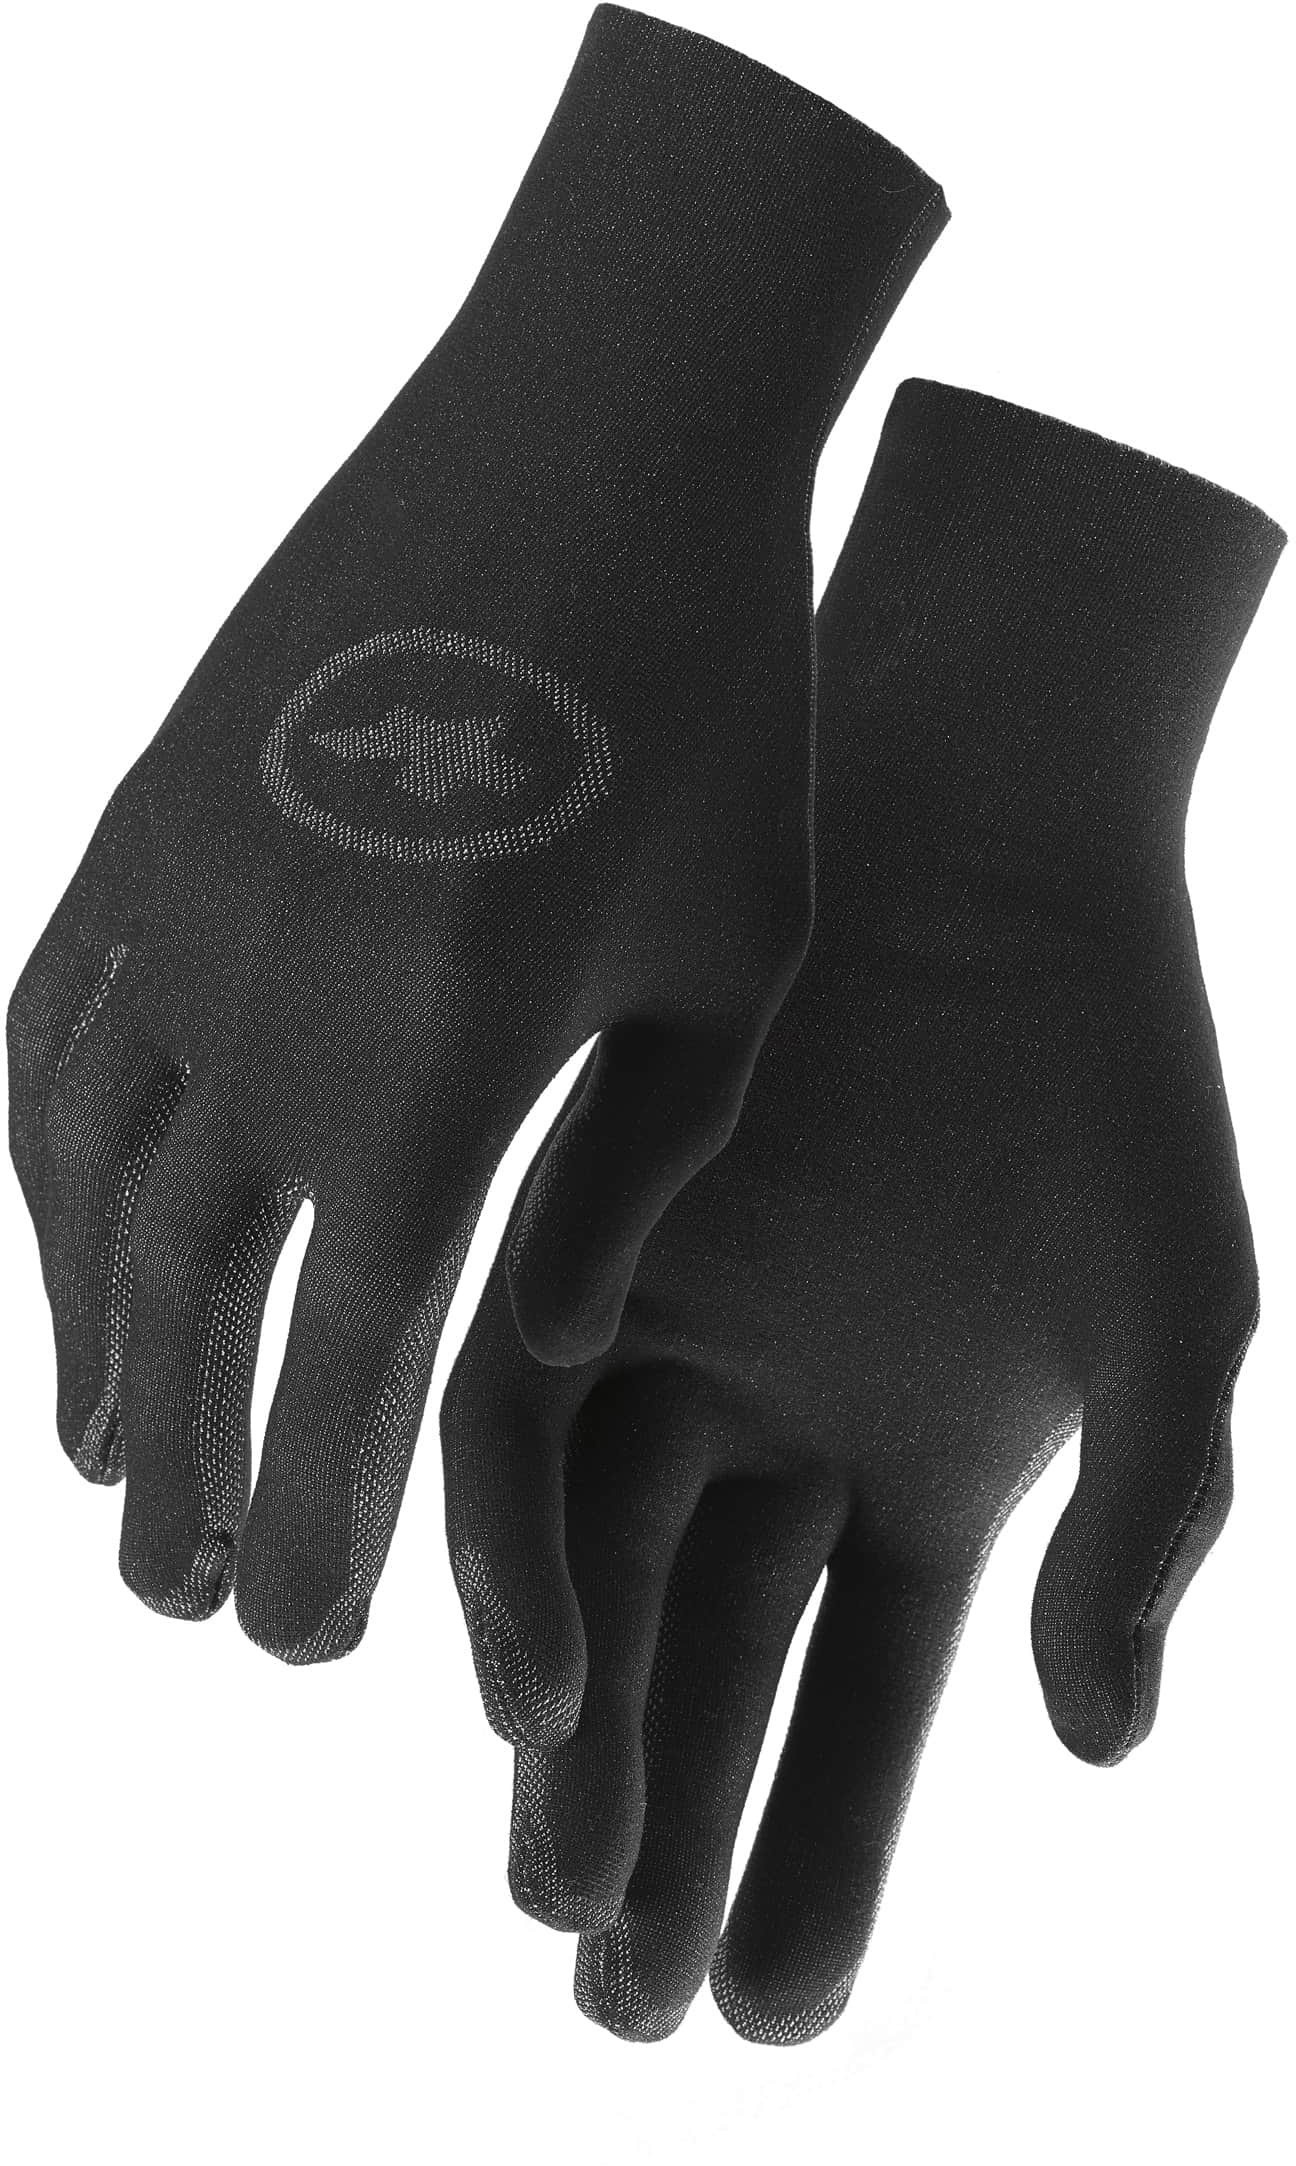 Assos ASSOSOIRES Spring Fall Liner Gloves Cykelhandsker - Sort